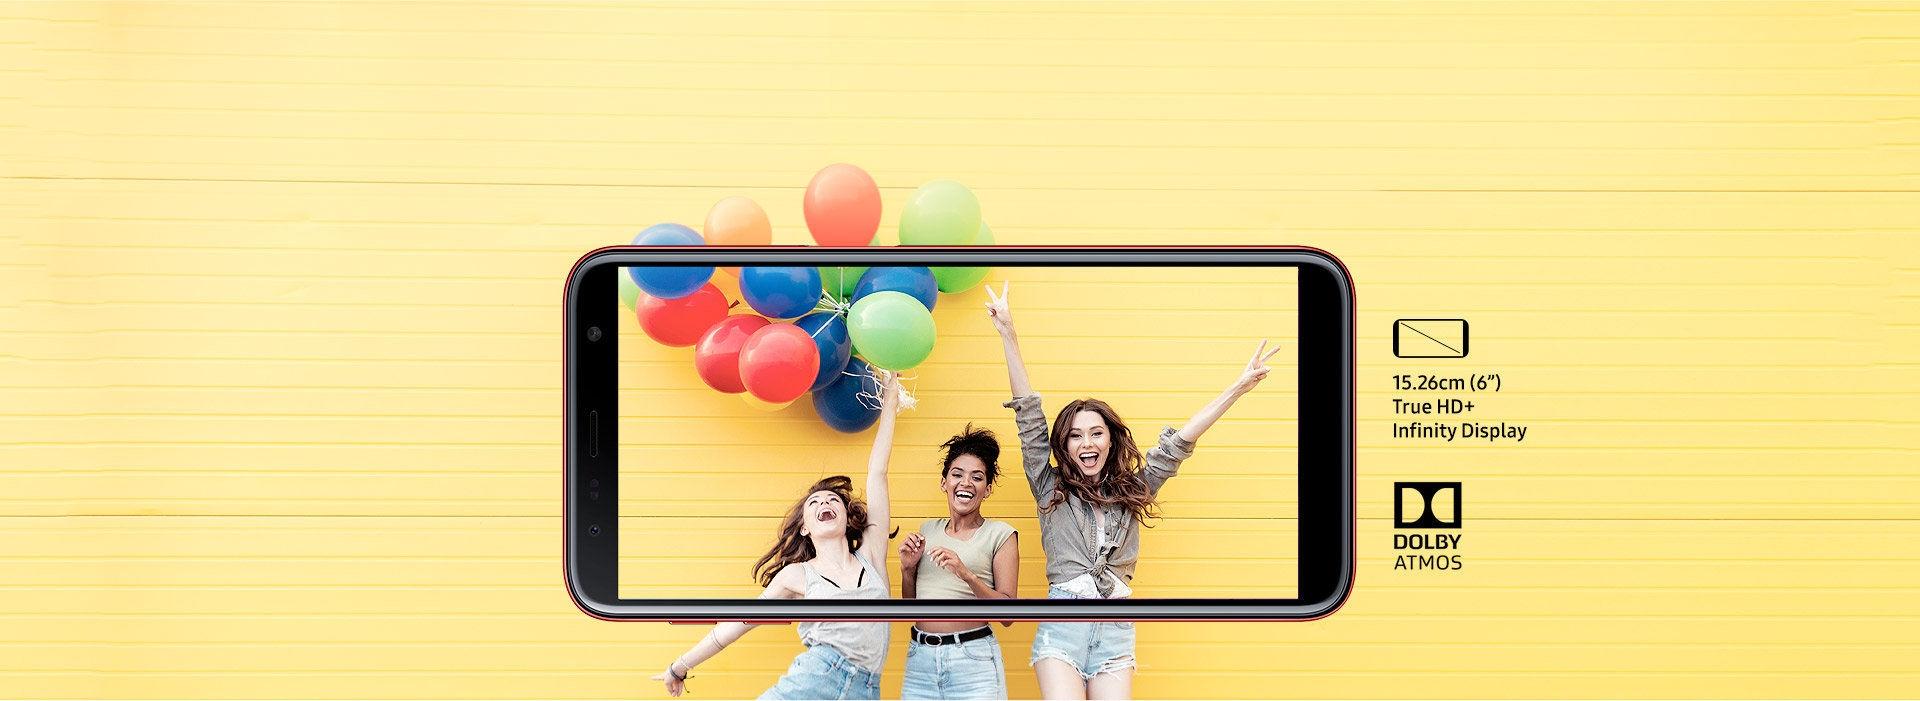 Infinity Display - Samsung Galaxy J6+